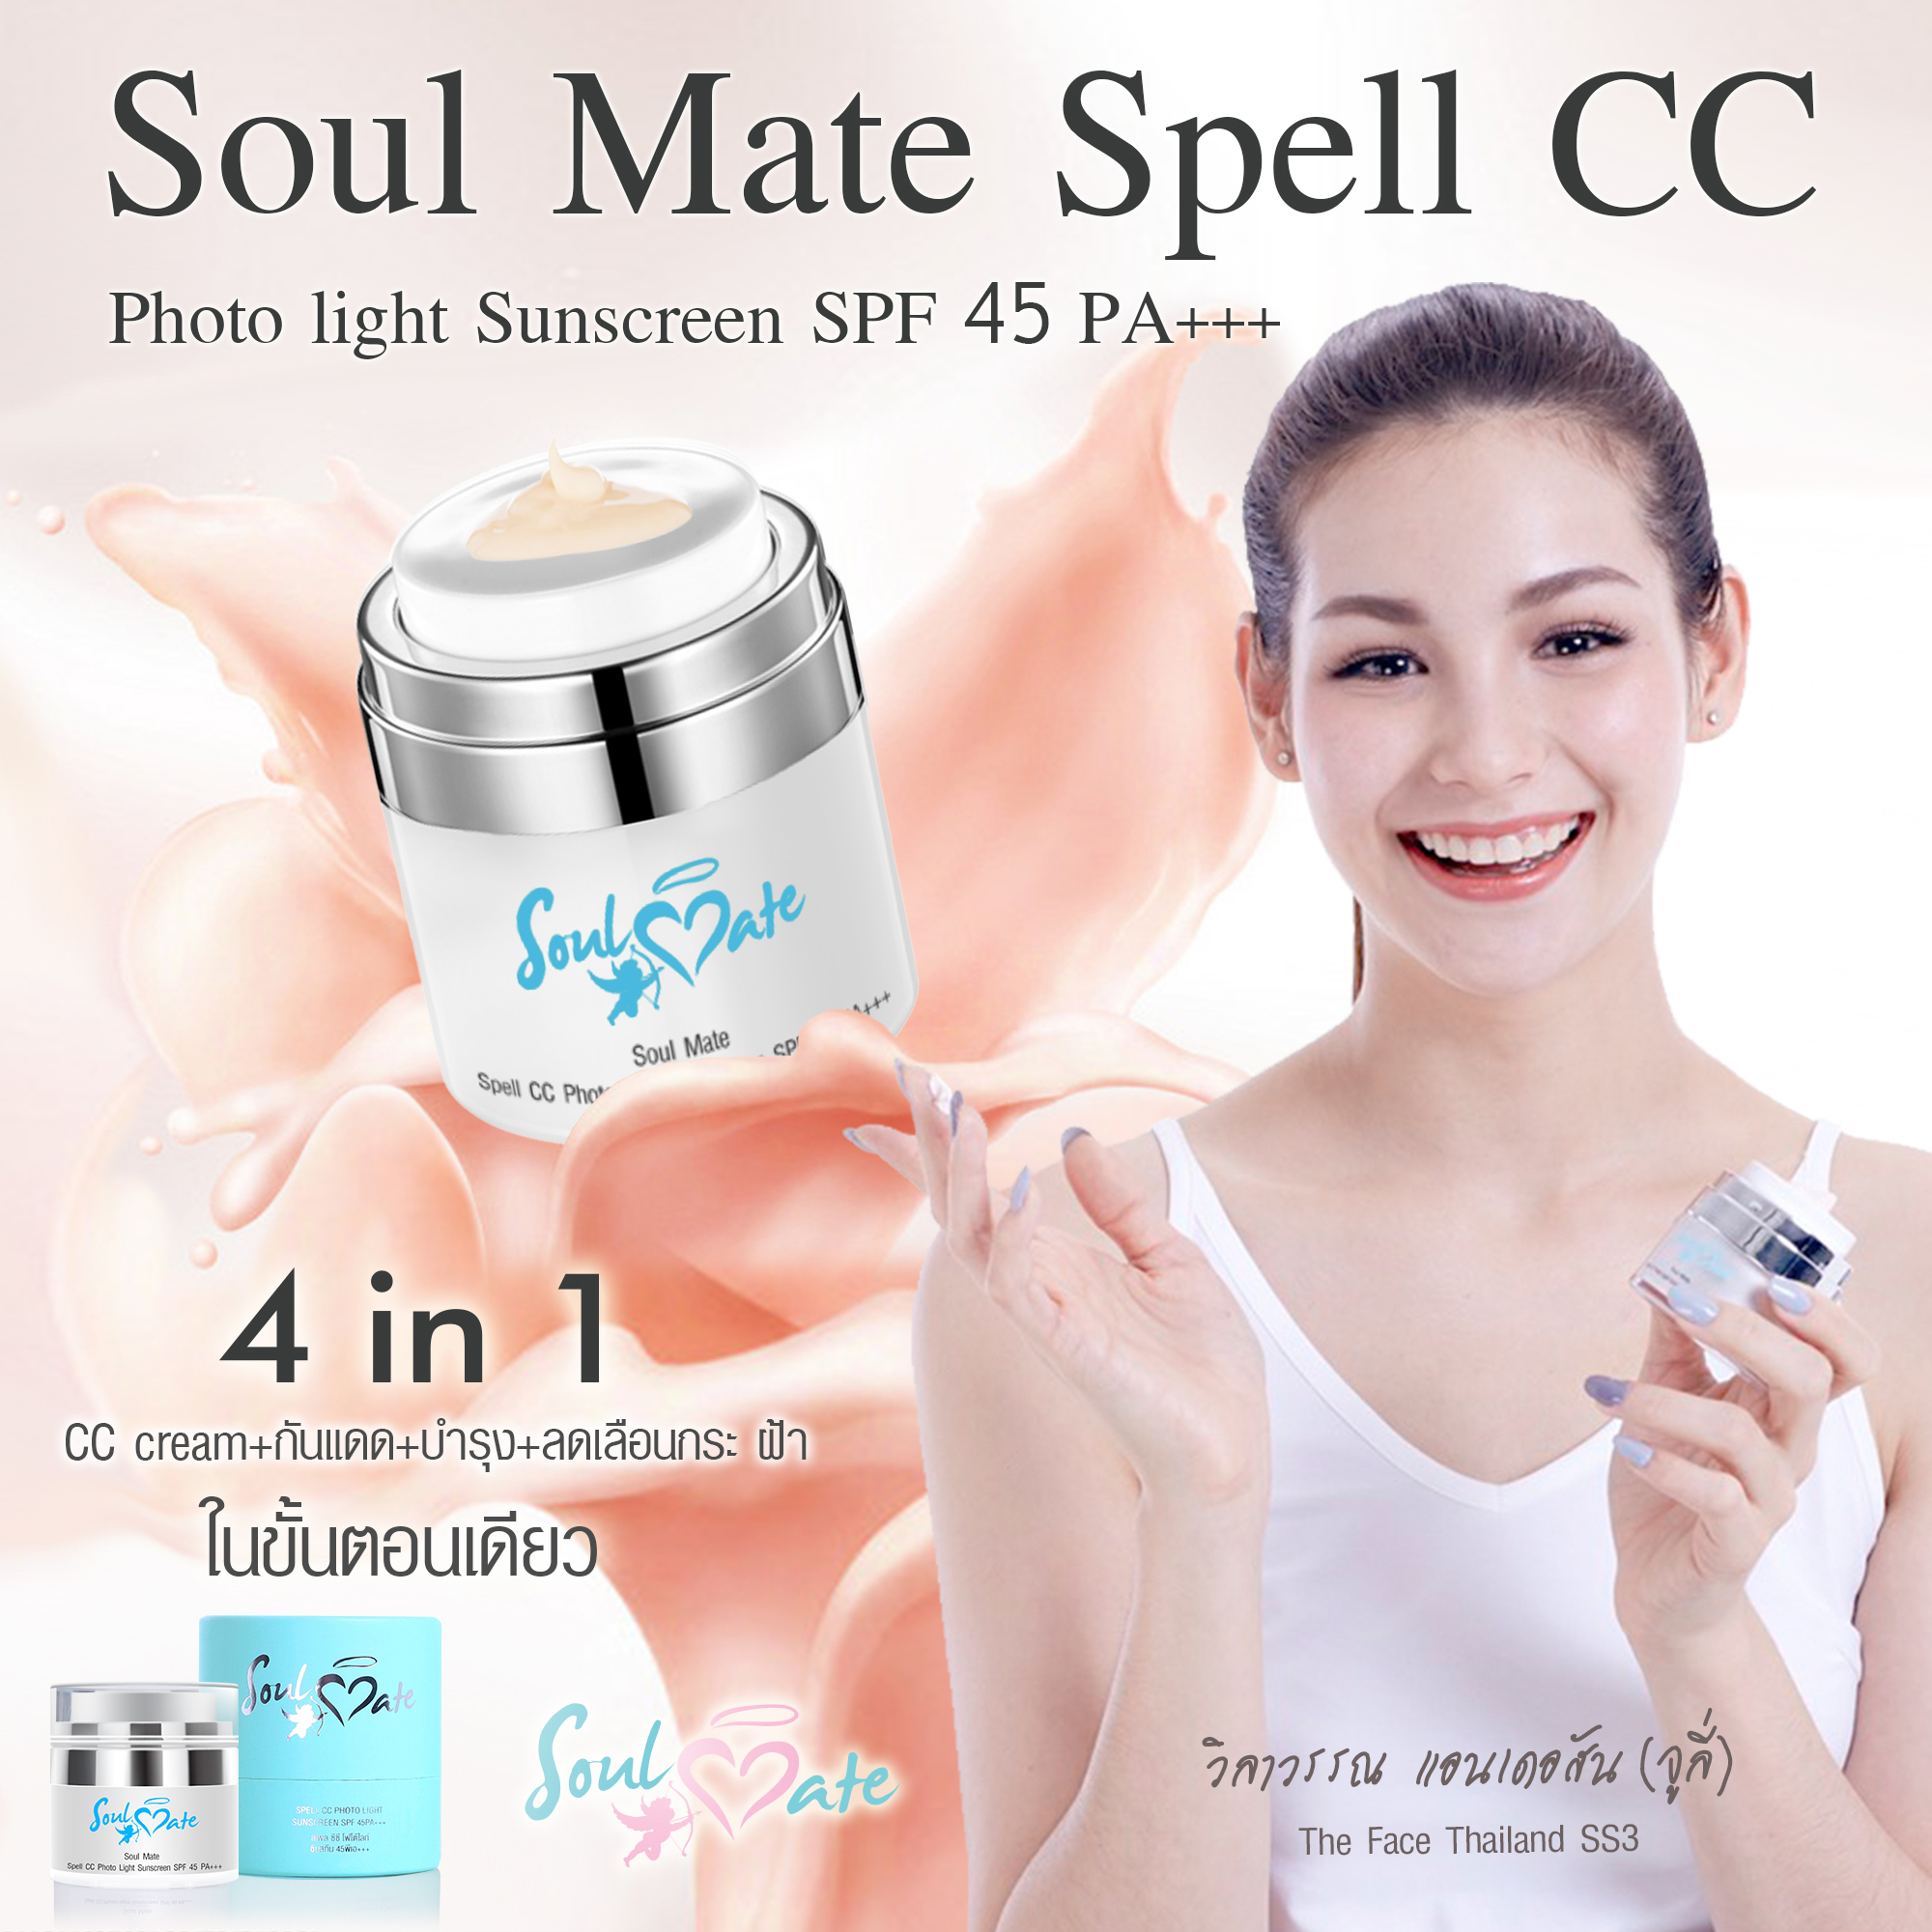 Soul Mate Spell CC Photo Light Sunscreen SPF PA45+++ ( 1 กระปุก)